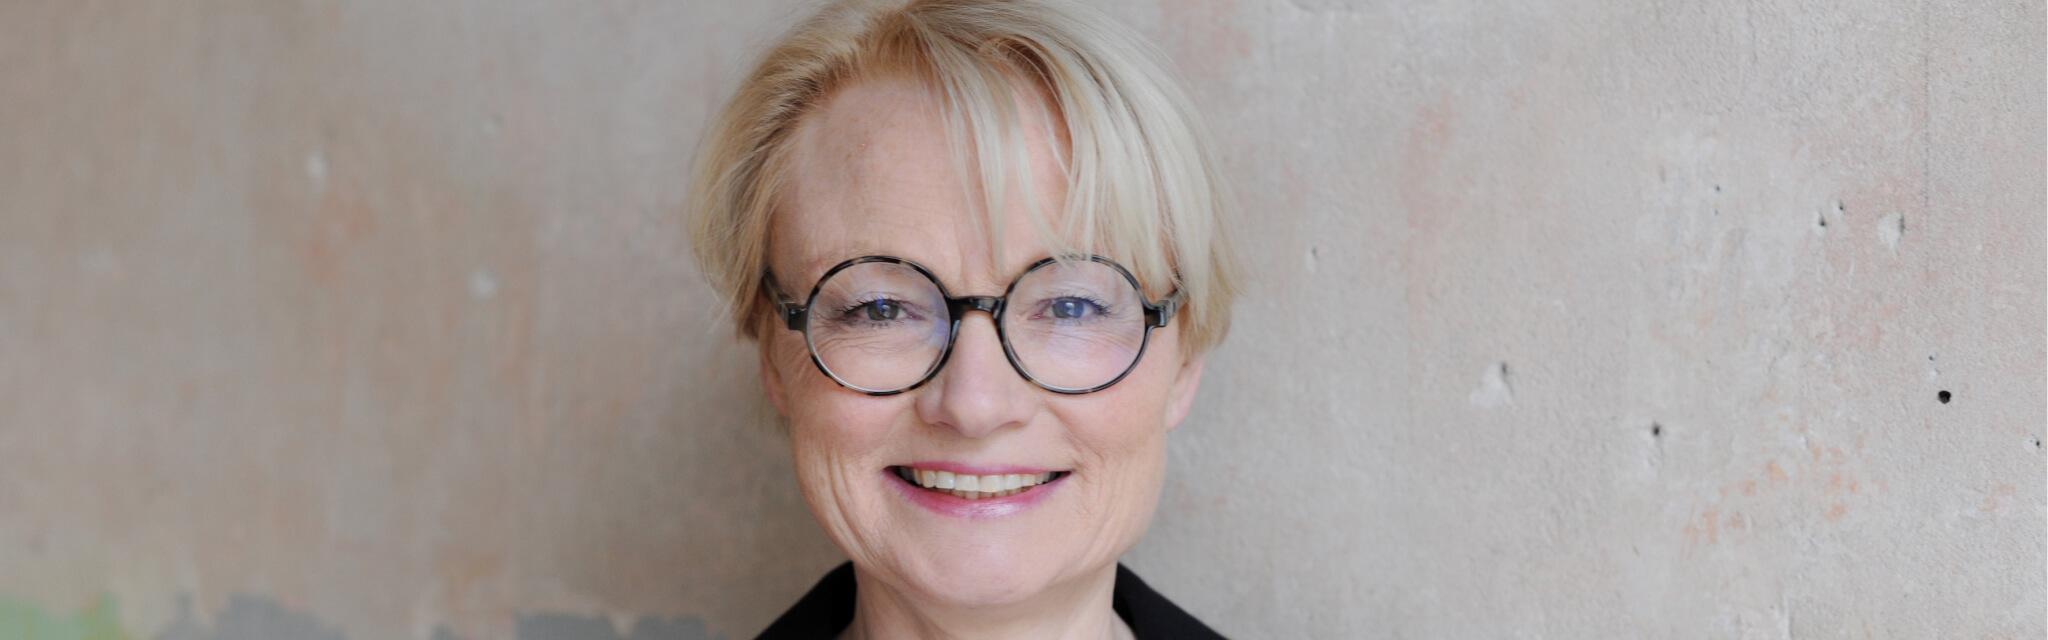 Antje Wilmink Profil-Foto